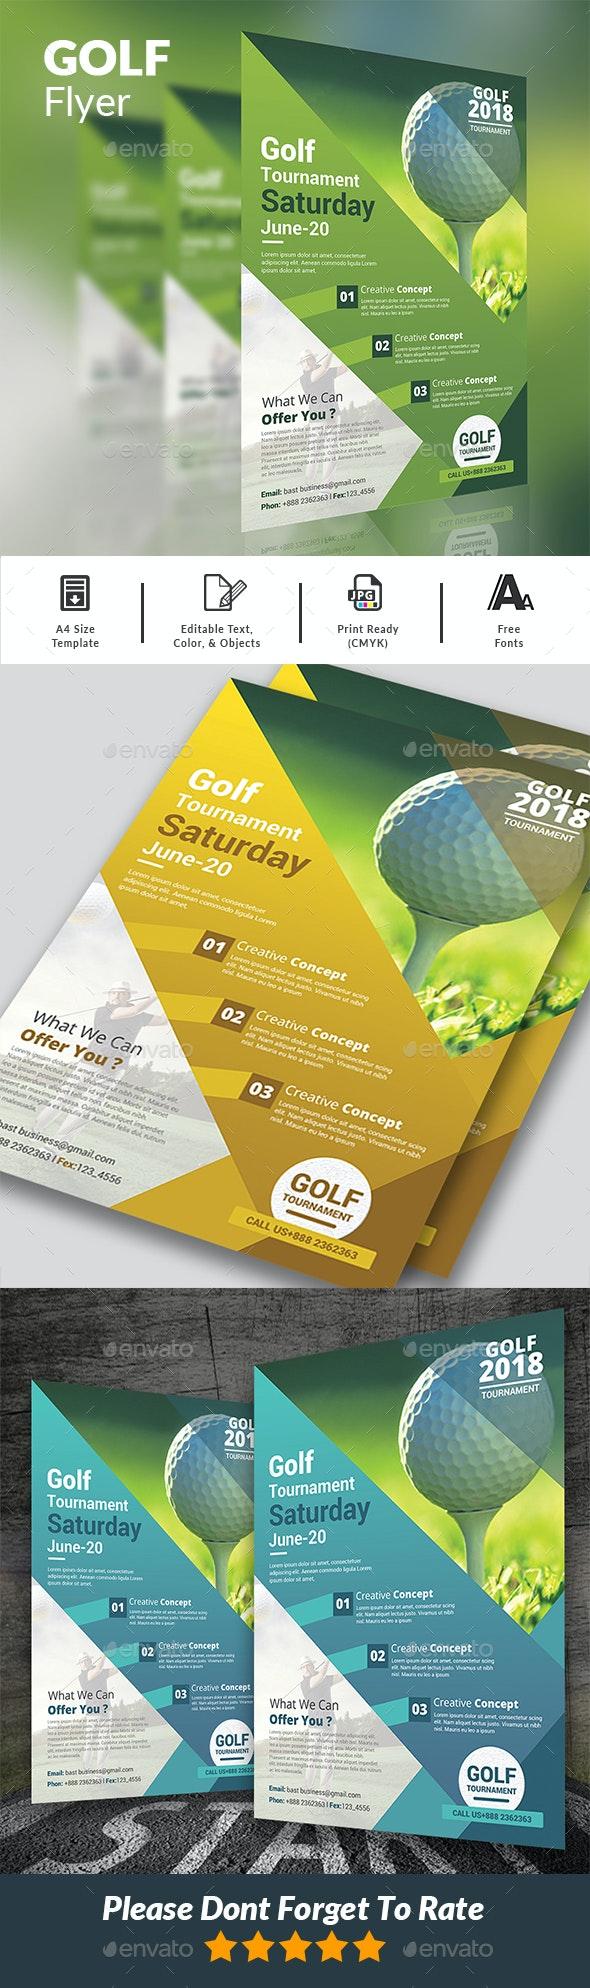 Golf Flyer - Events Flyers